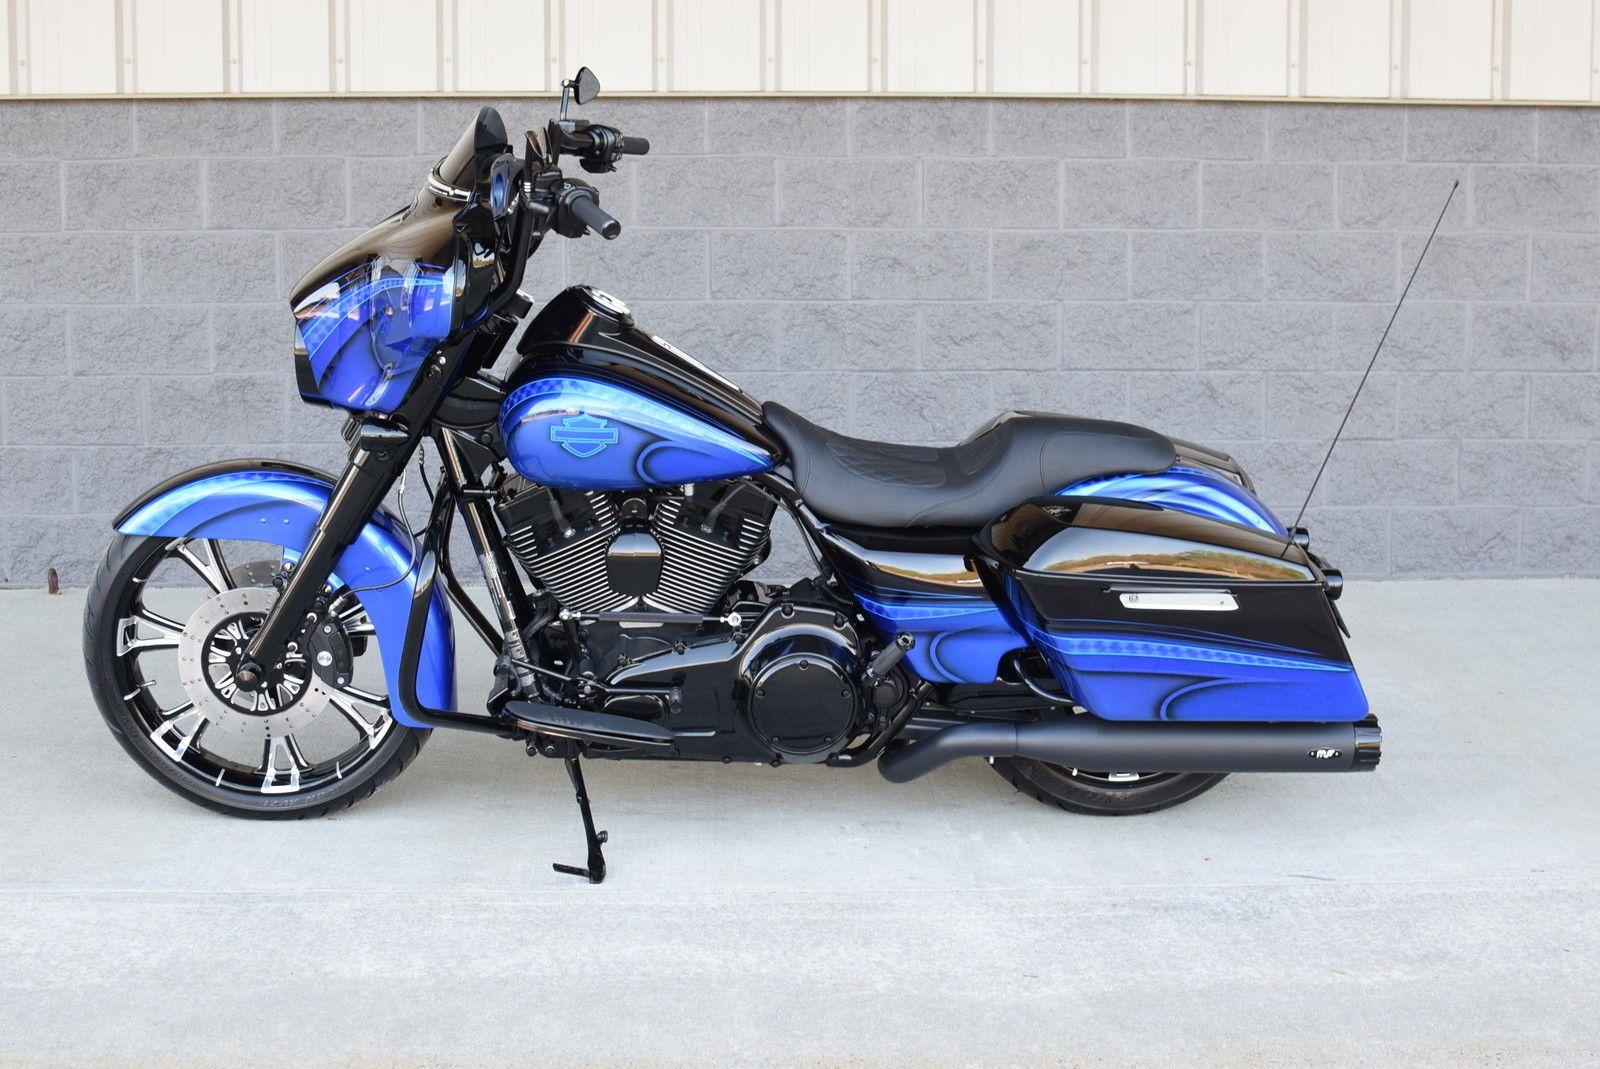 2015 Harley-Davidson® STREET GLIDE CUSTOM - CANDY BLUE BAGGER